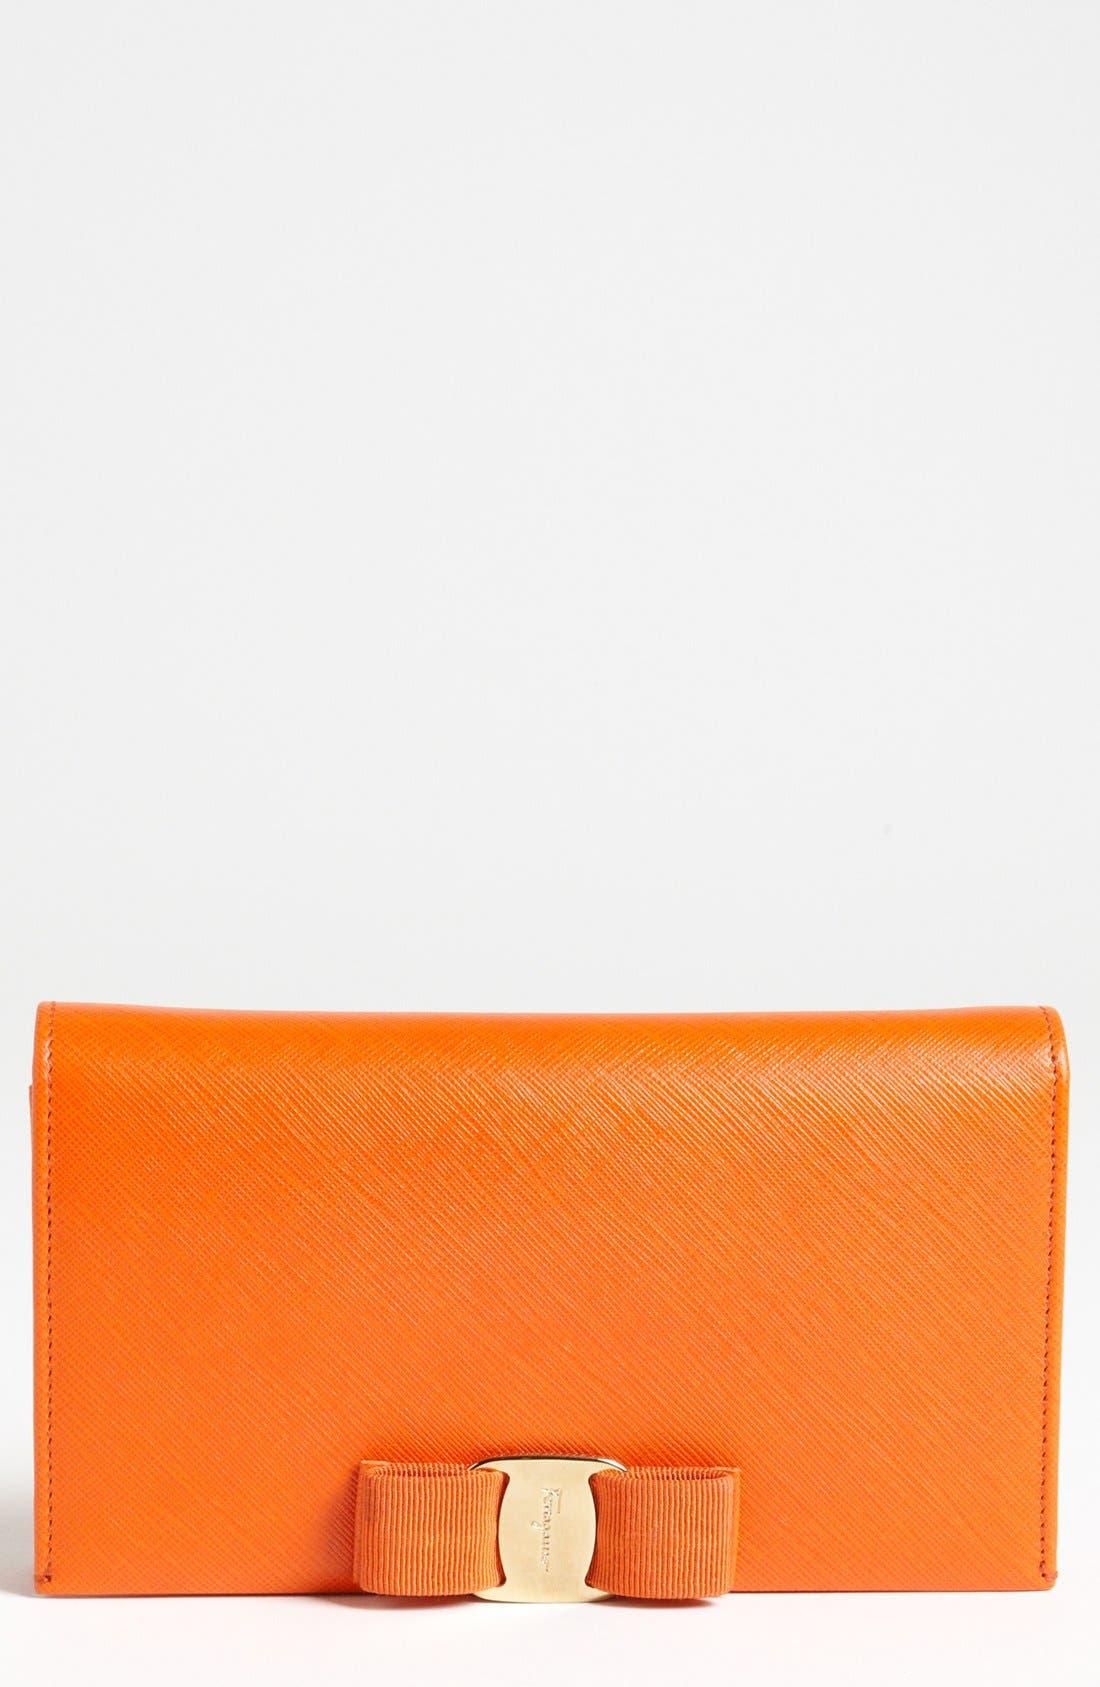 Main Image - Salavatore Ferragamo 'Miss Vara' Leather Wallet on a Chain